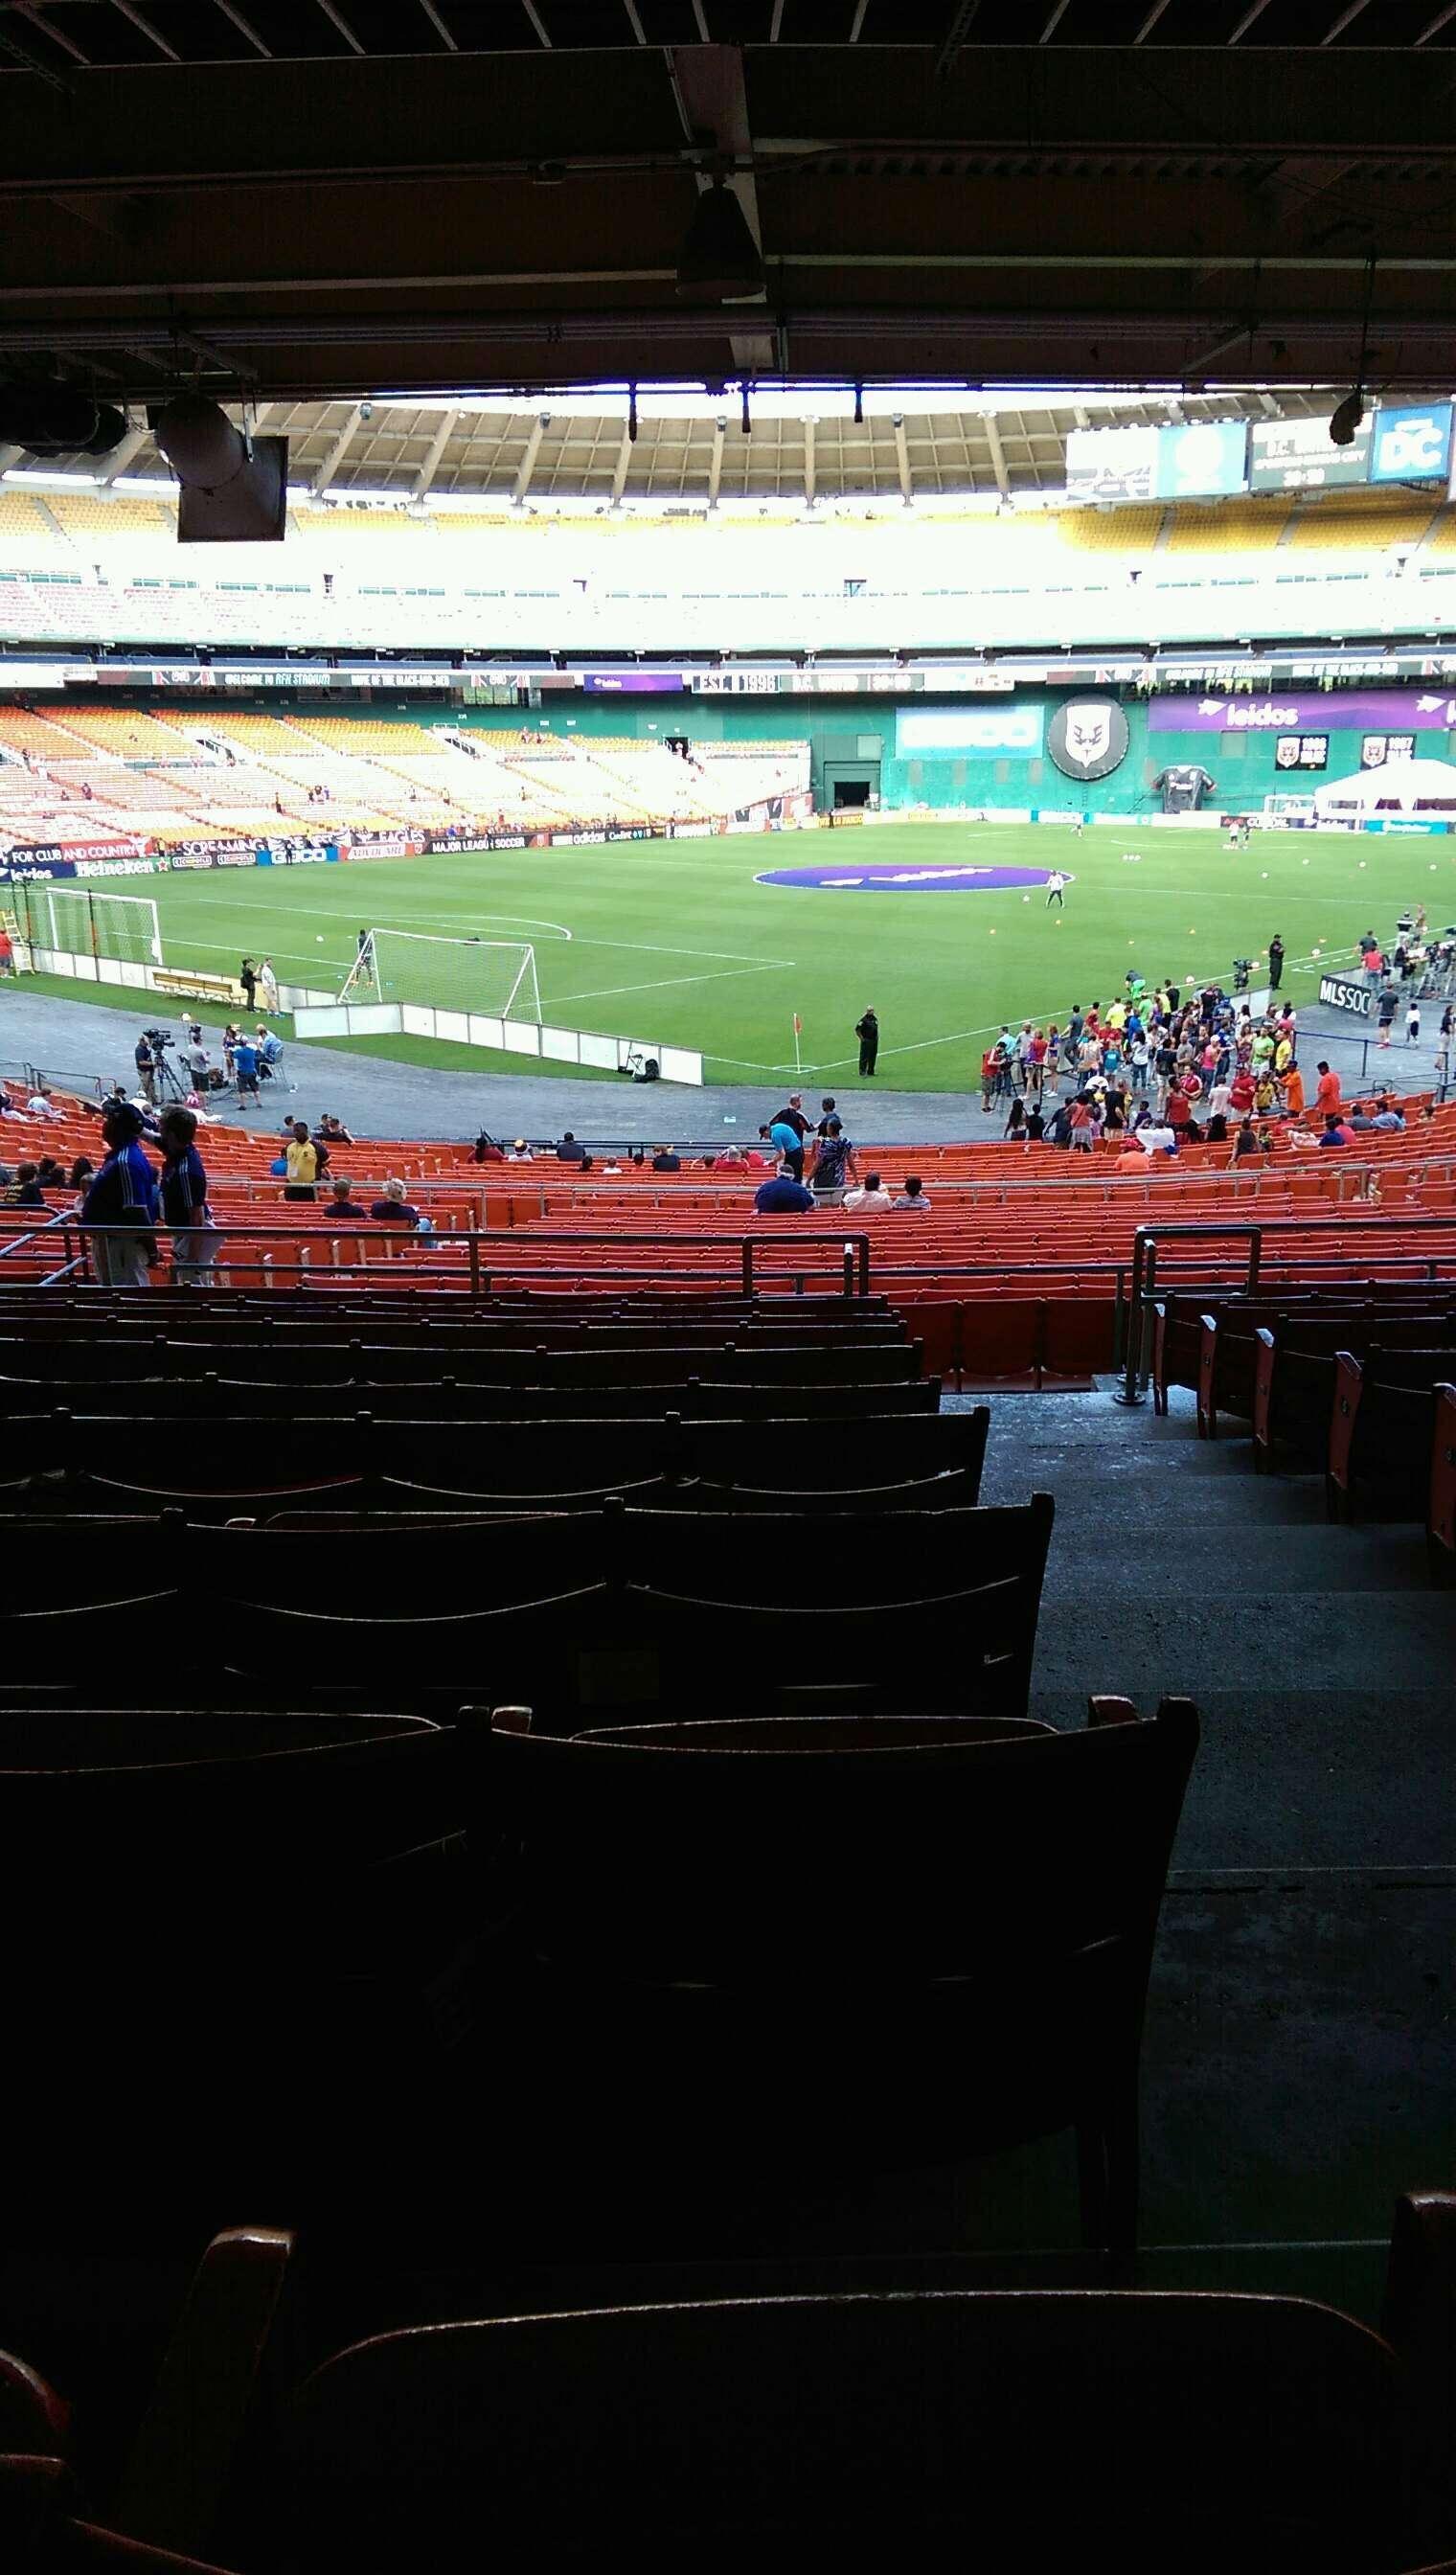 RFK Stadium Section 315 Row 11 Seat 1